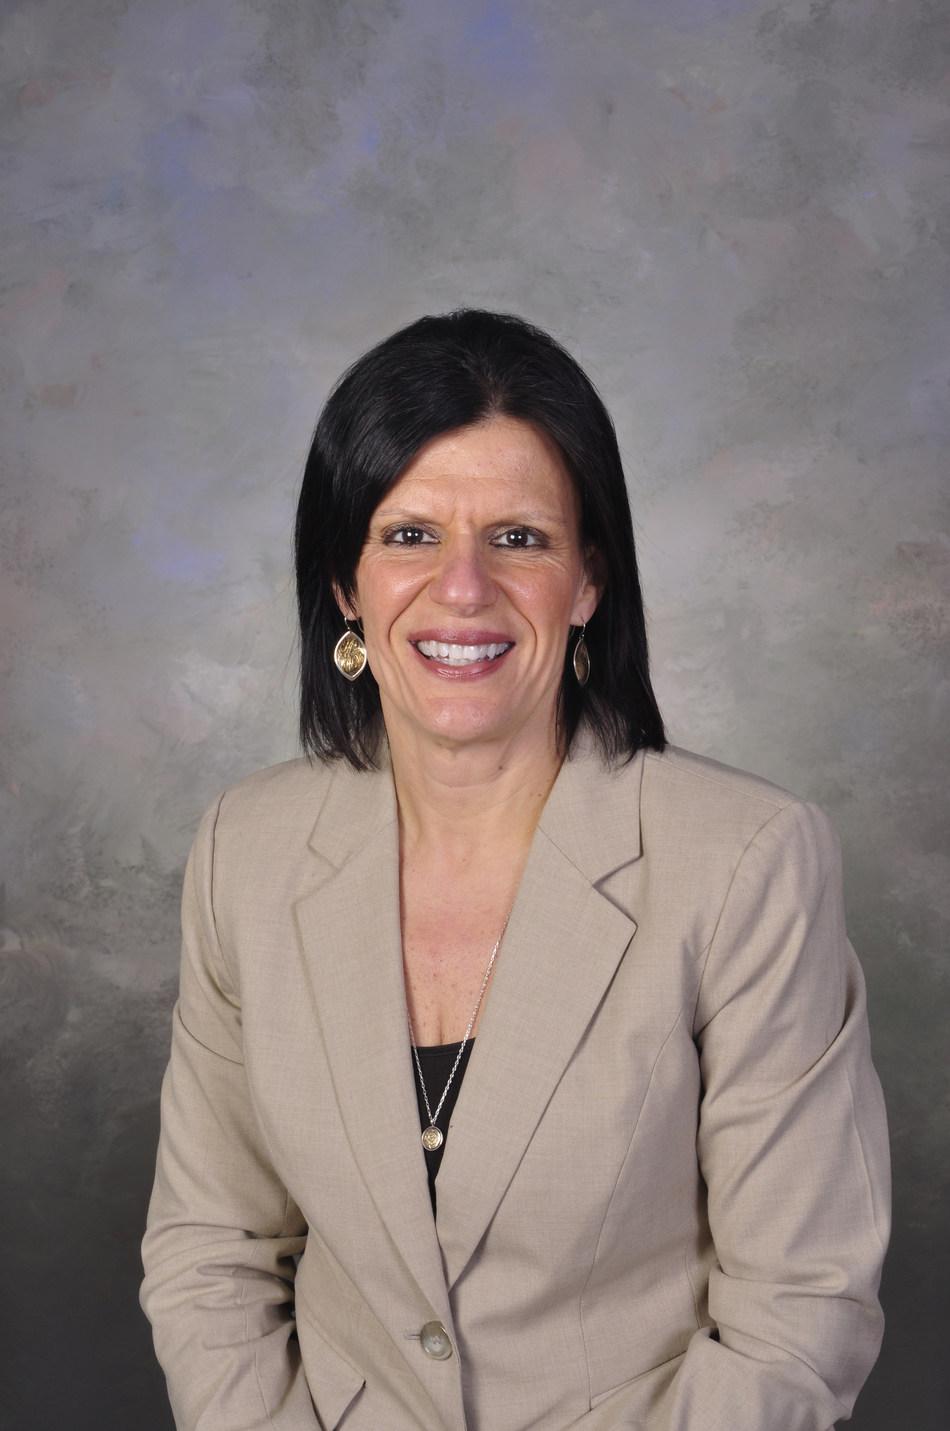 Susan Robel, Geisinger's chief nursing officer and executive vice president who is leading the Geisinger Nursing Institute endeavor.